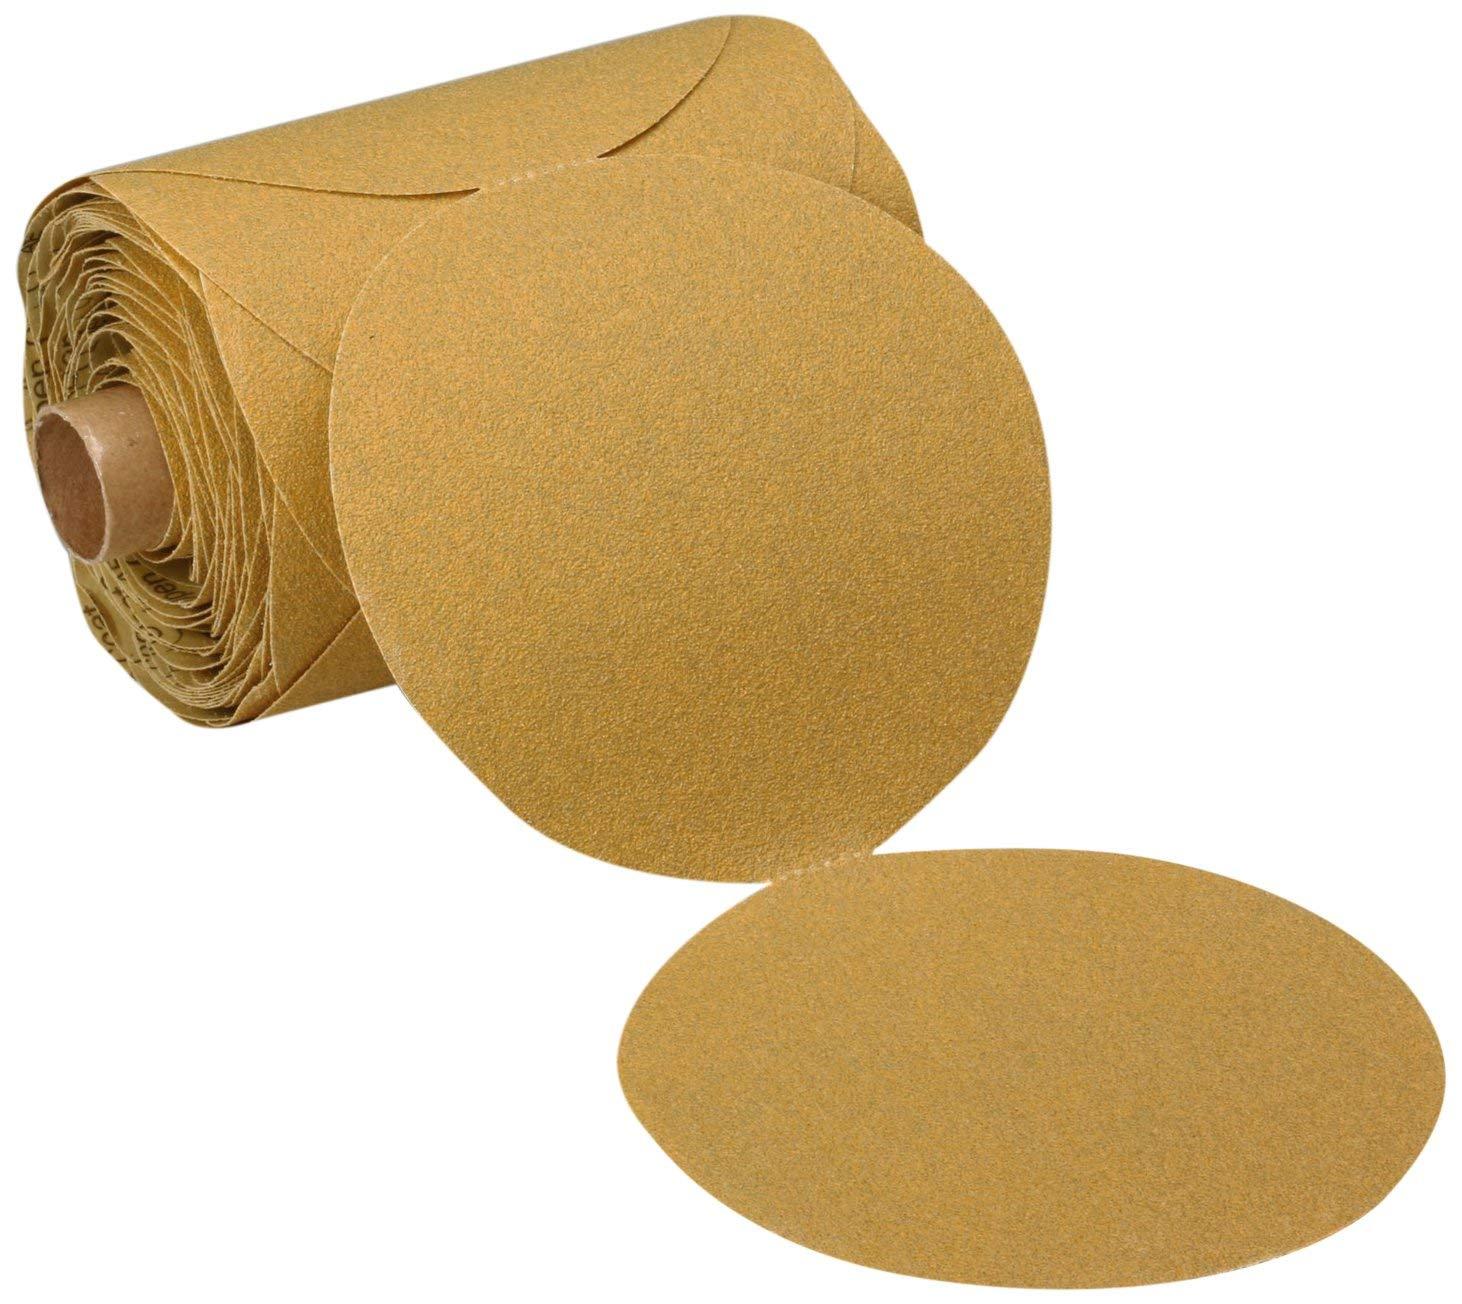 "3M Stikit Paper Disc Roll 363I, PSA Attachment, Aluminum Oxide, 5"" Diameter, 80 Grit (Roll of 100)"